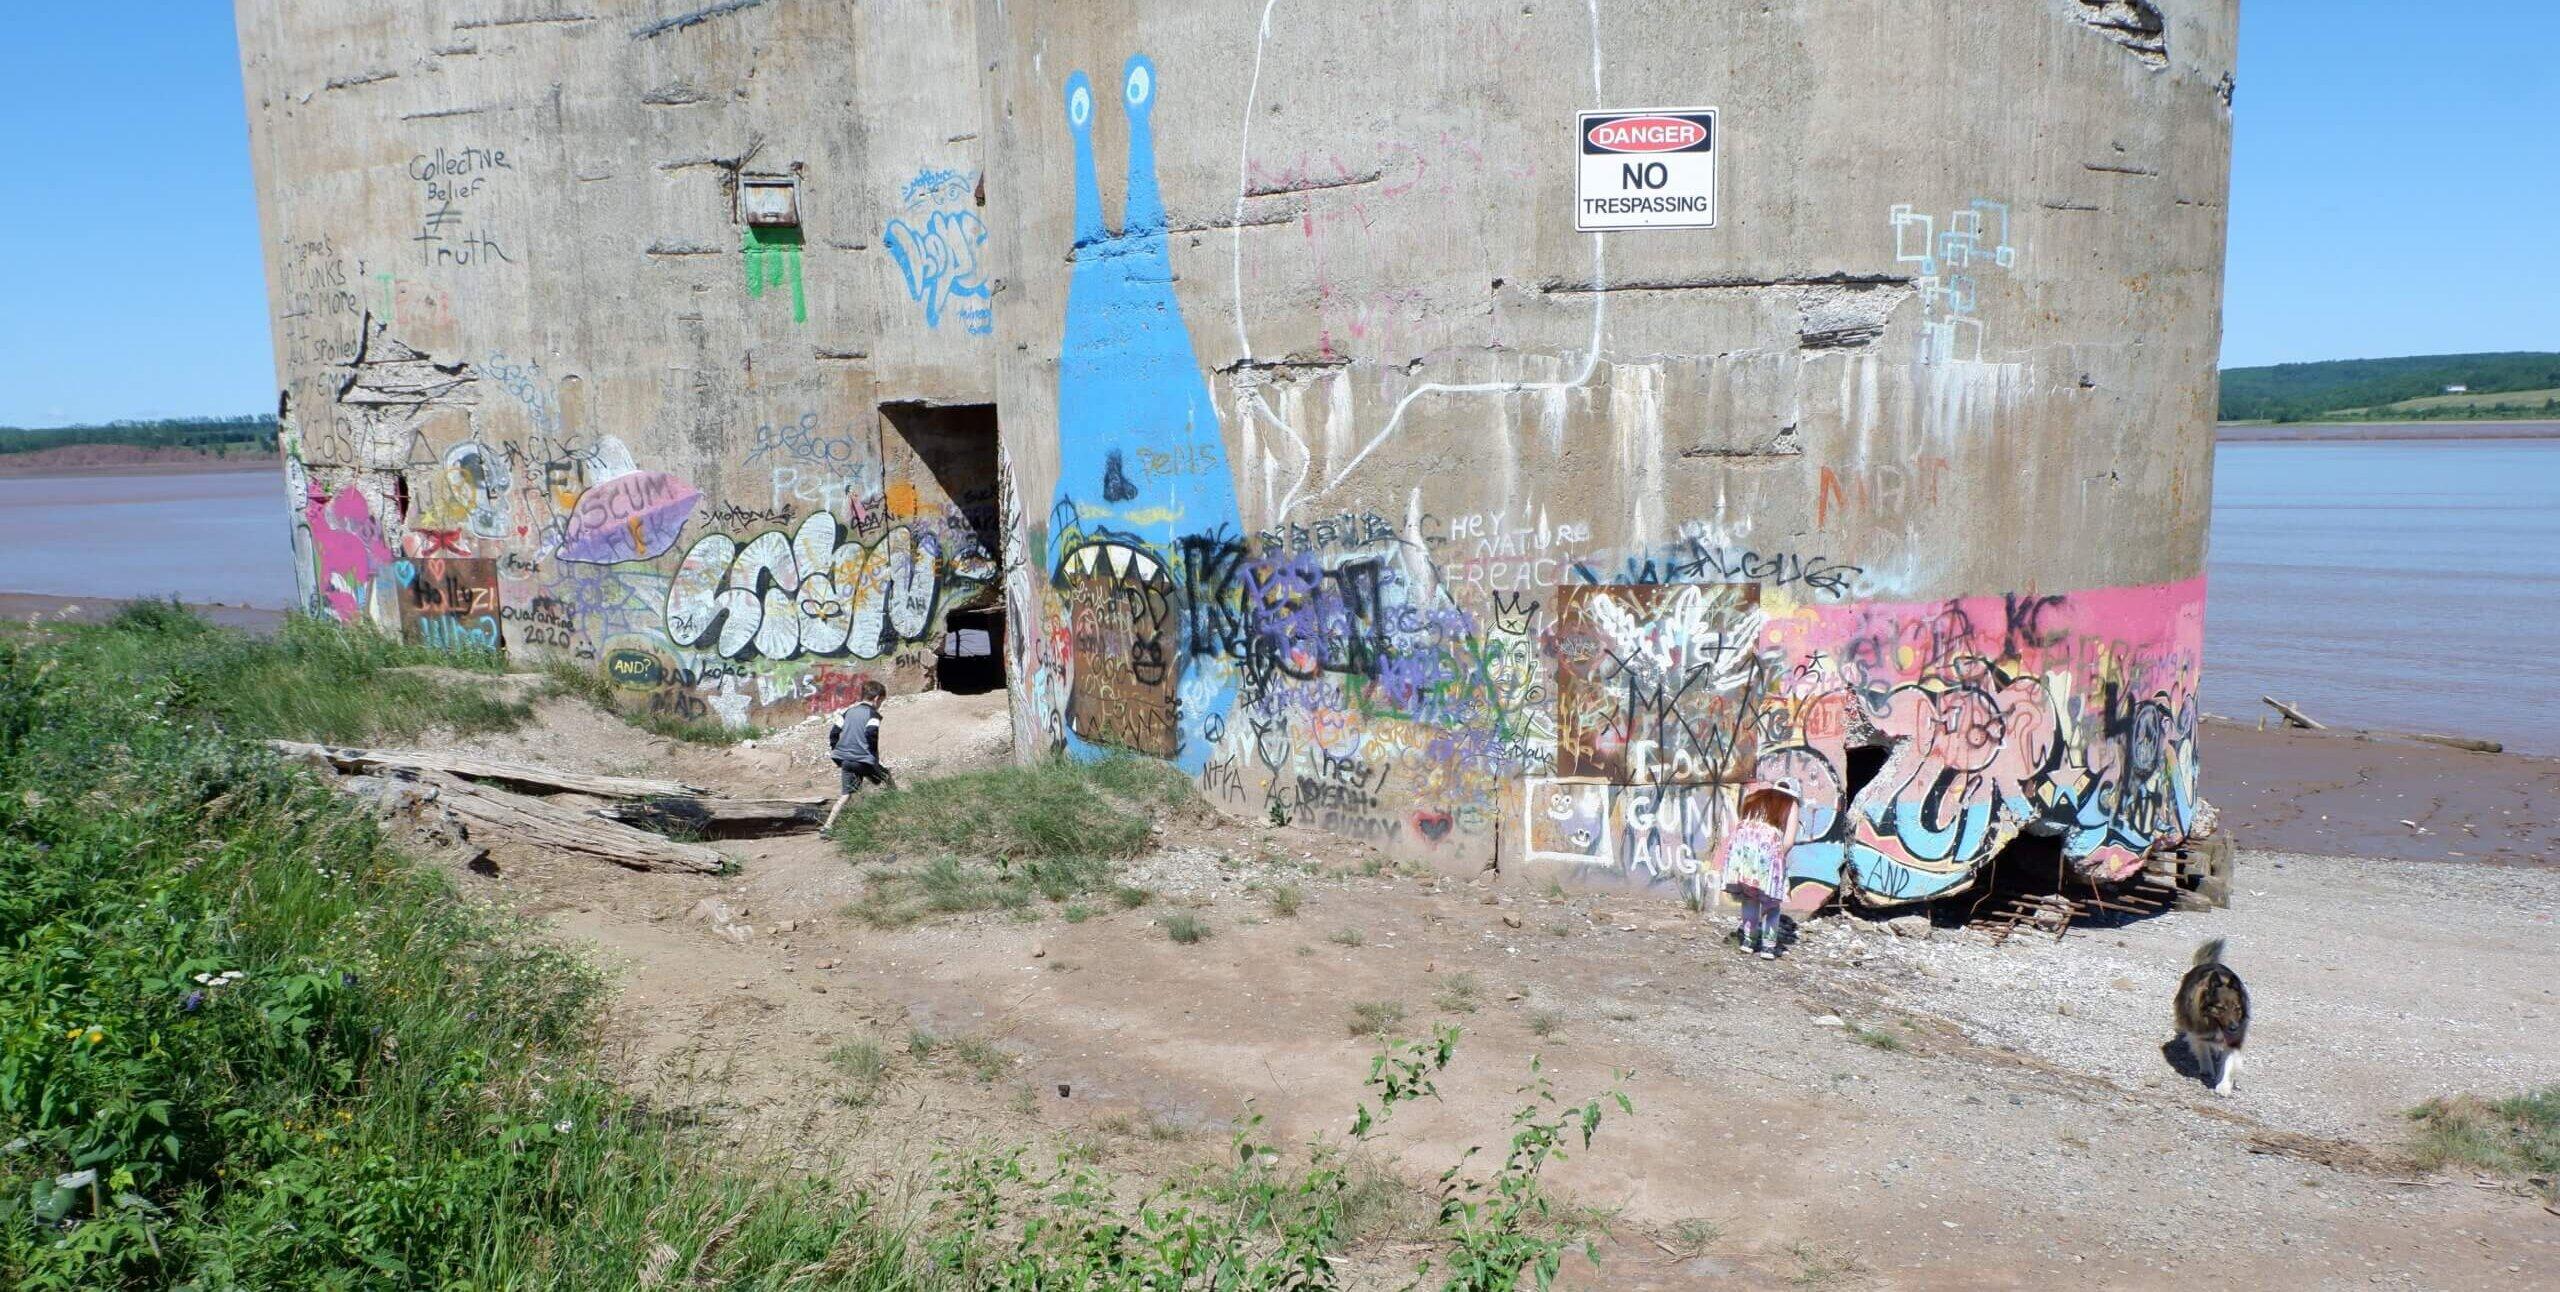 pickle planet children looking at graffiti on former gypsum silos by petitcodiac river in hillsborough new brunswick